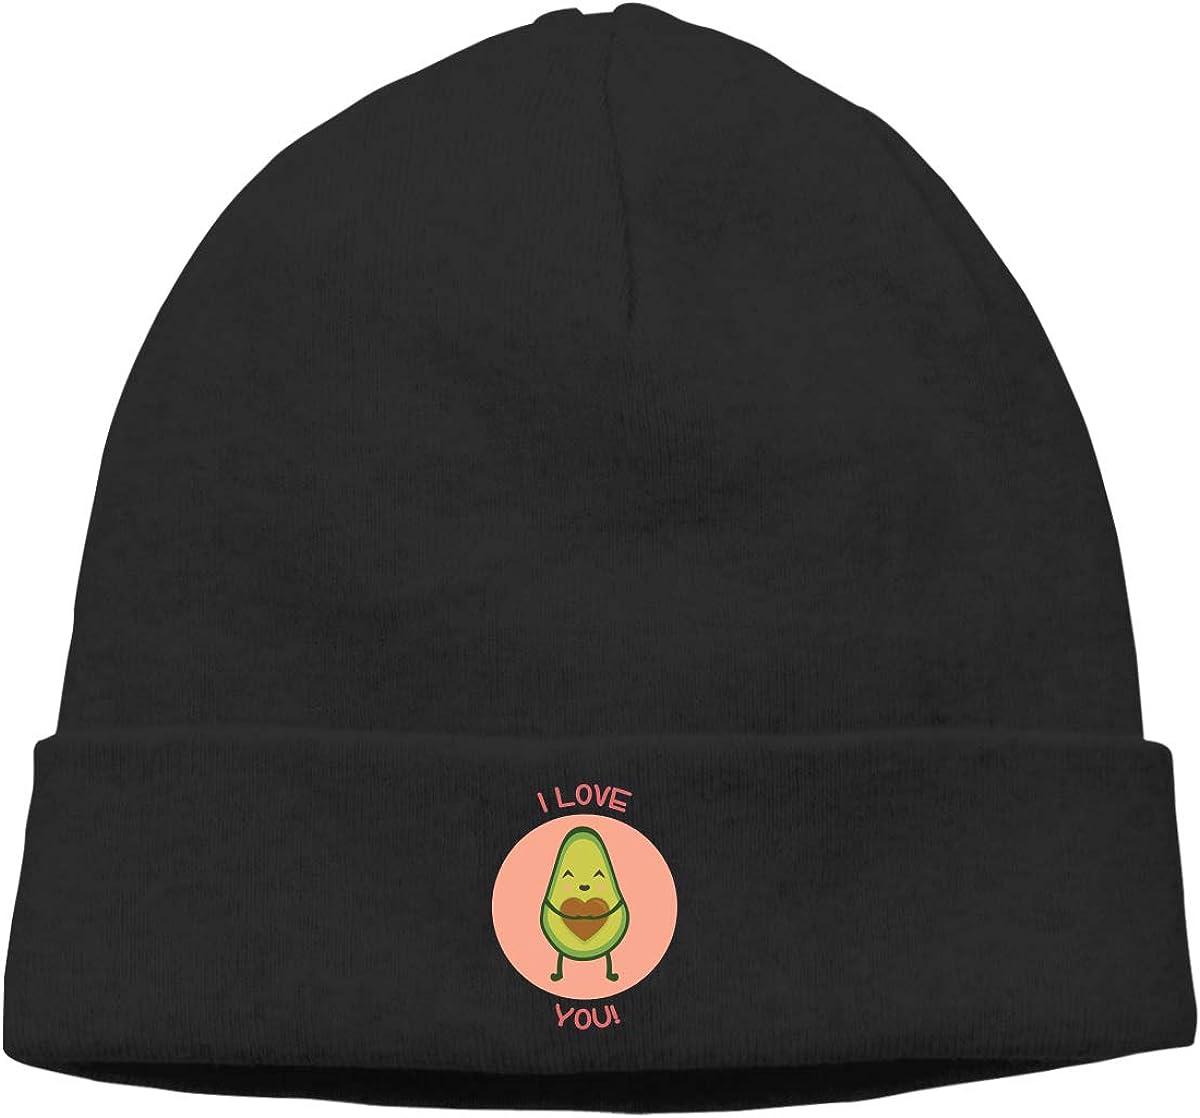 Avocado Love You Mens/&Womens Deliciously Soft Daily Beanie Skull Cap